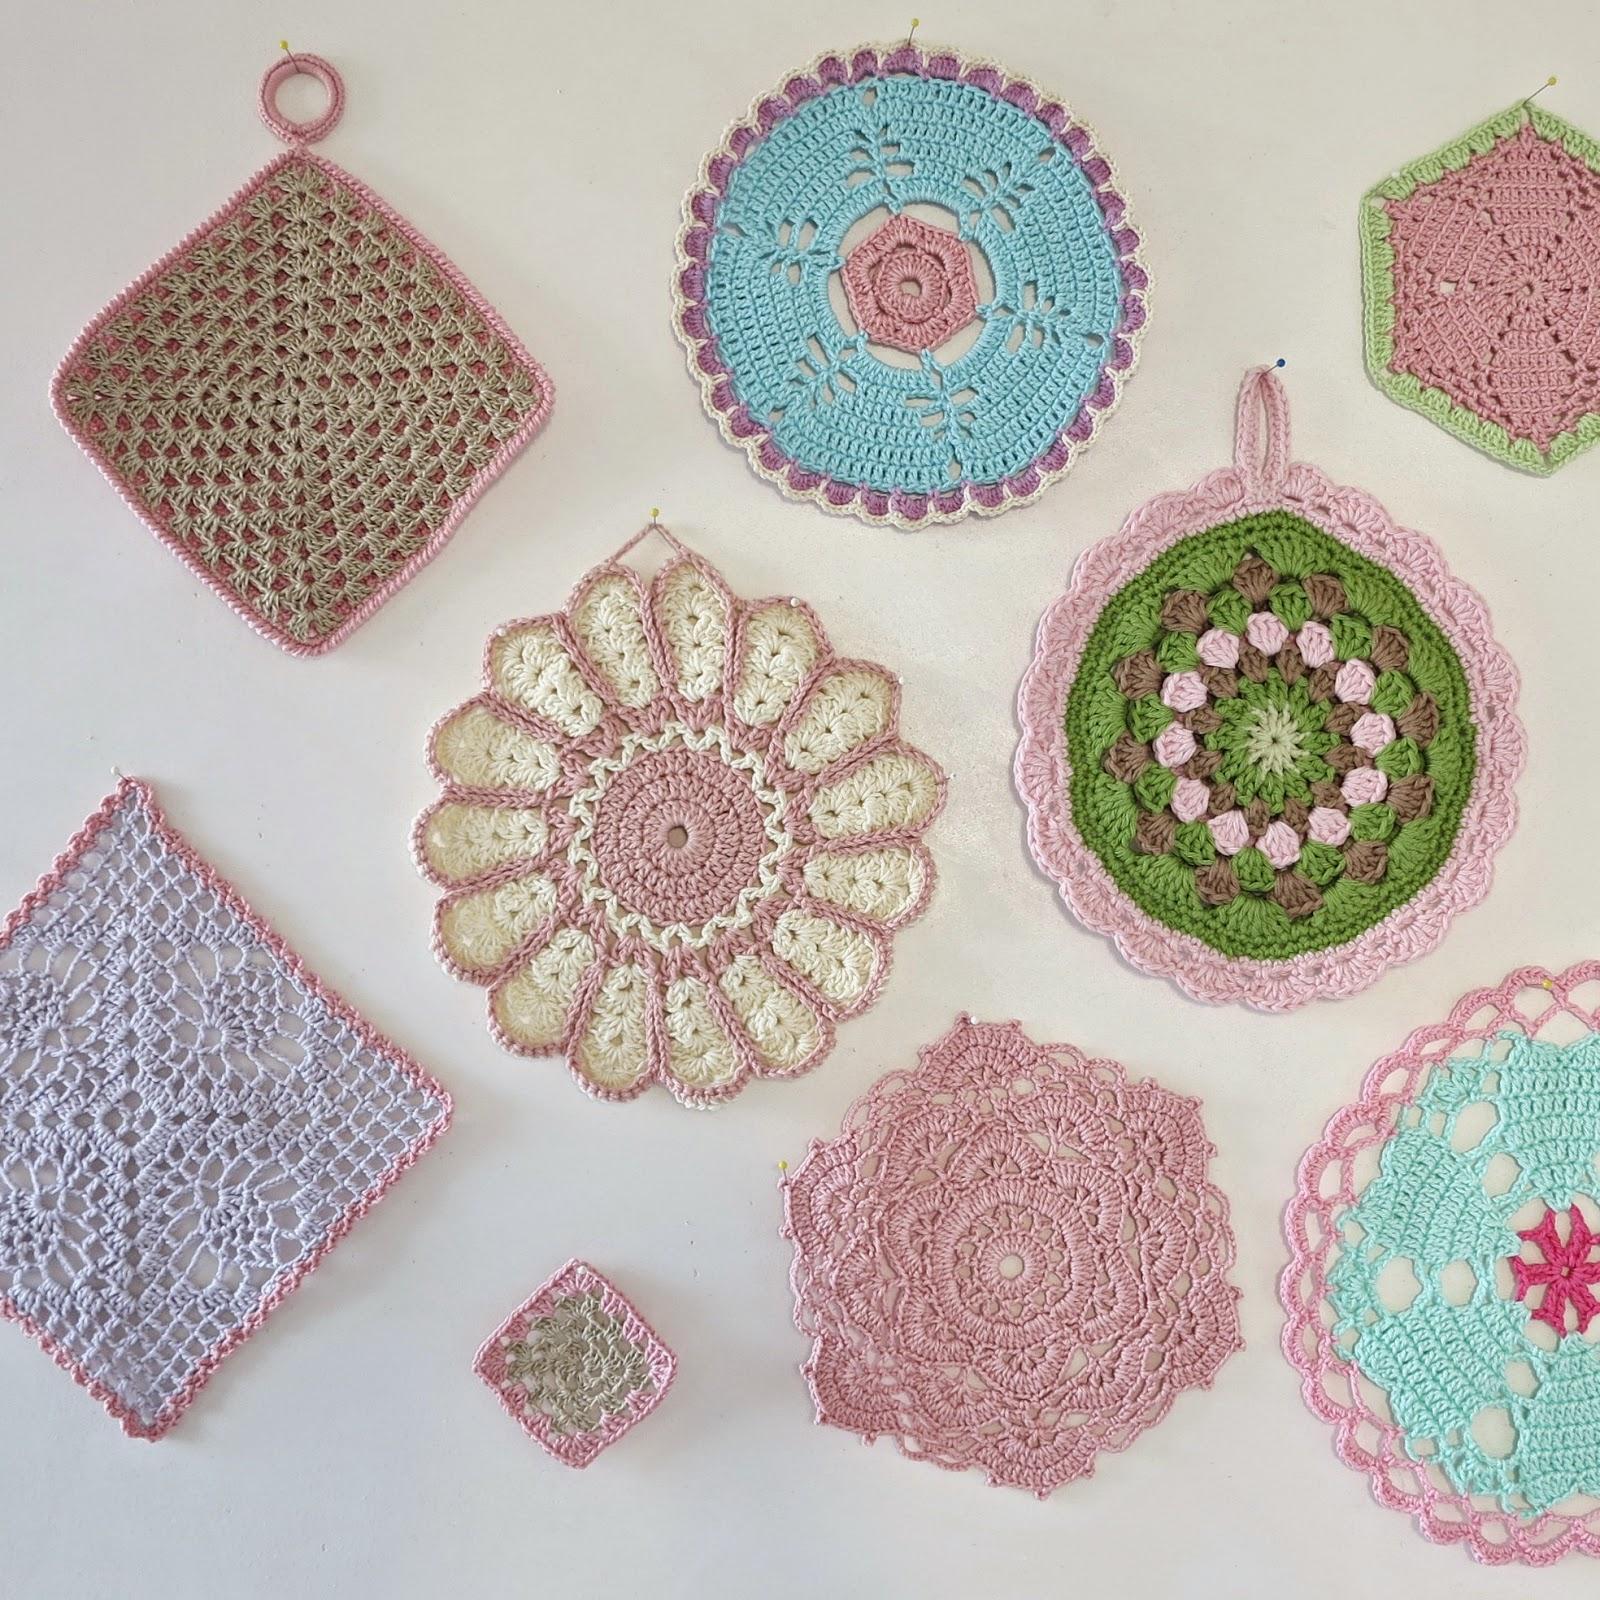 byHaafner, crochet, doily, potholder, pastel